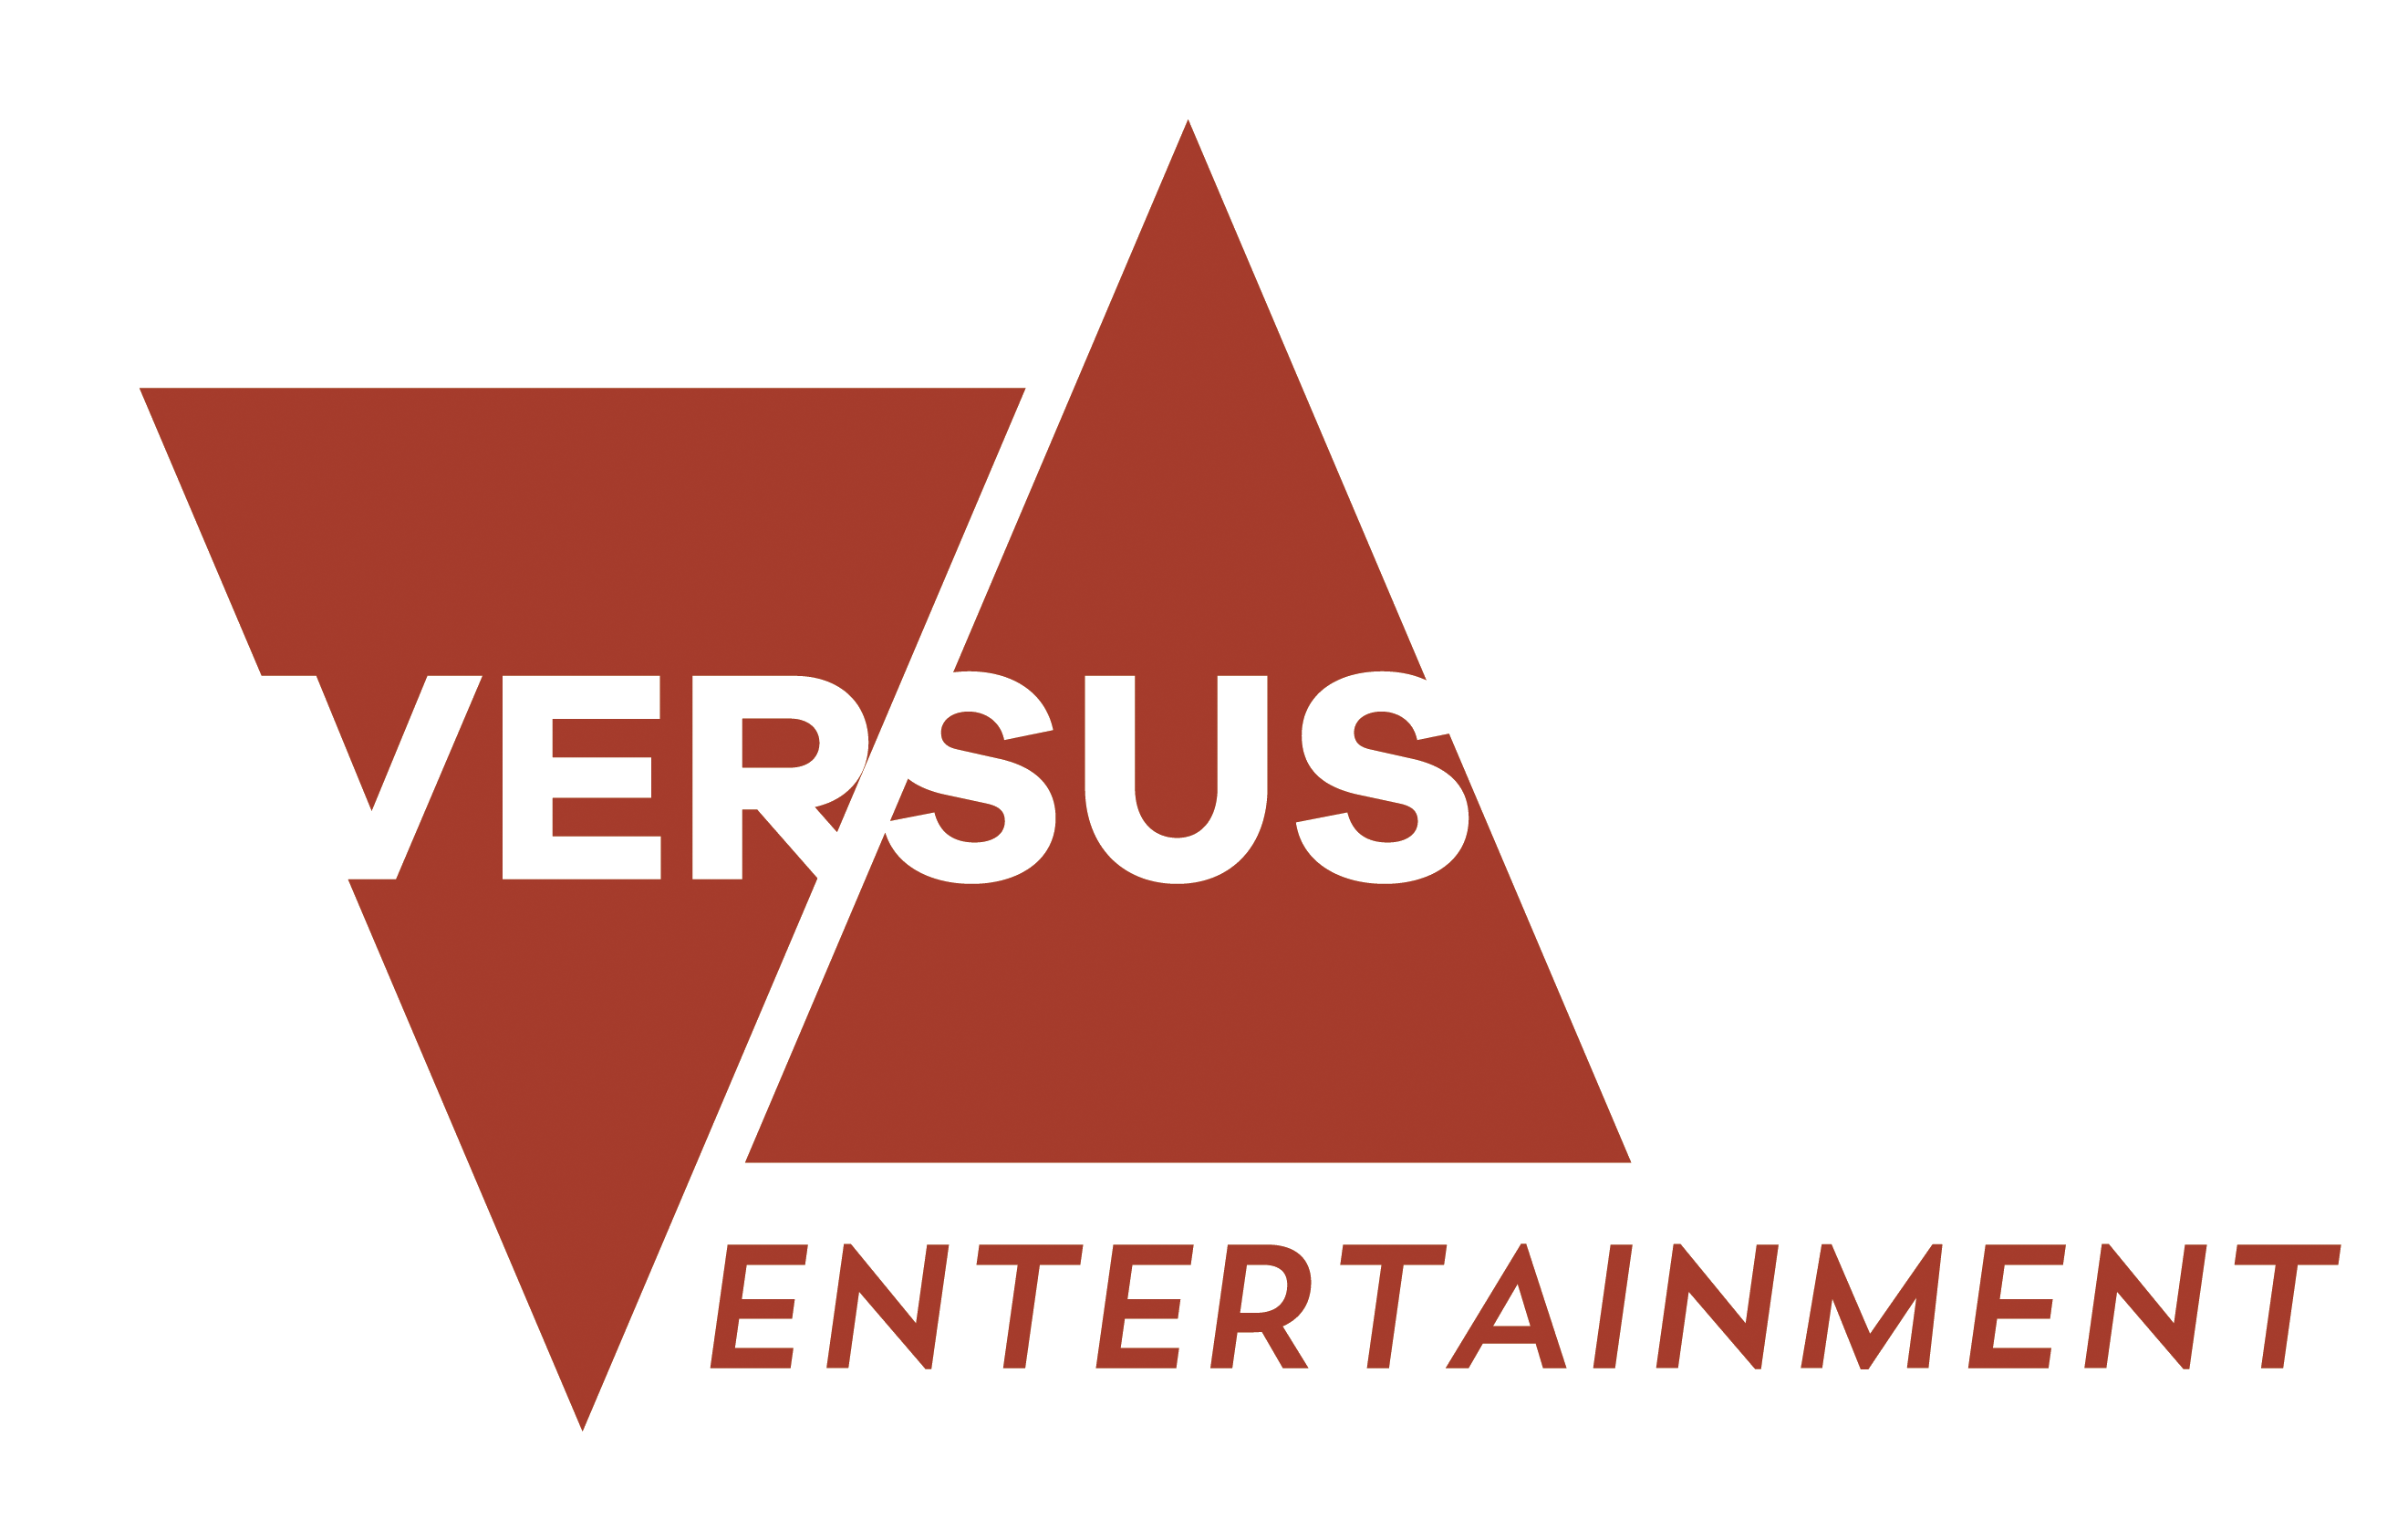 Versus Entertaiment